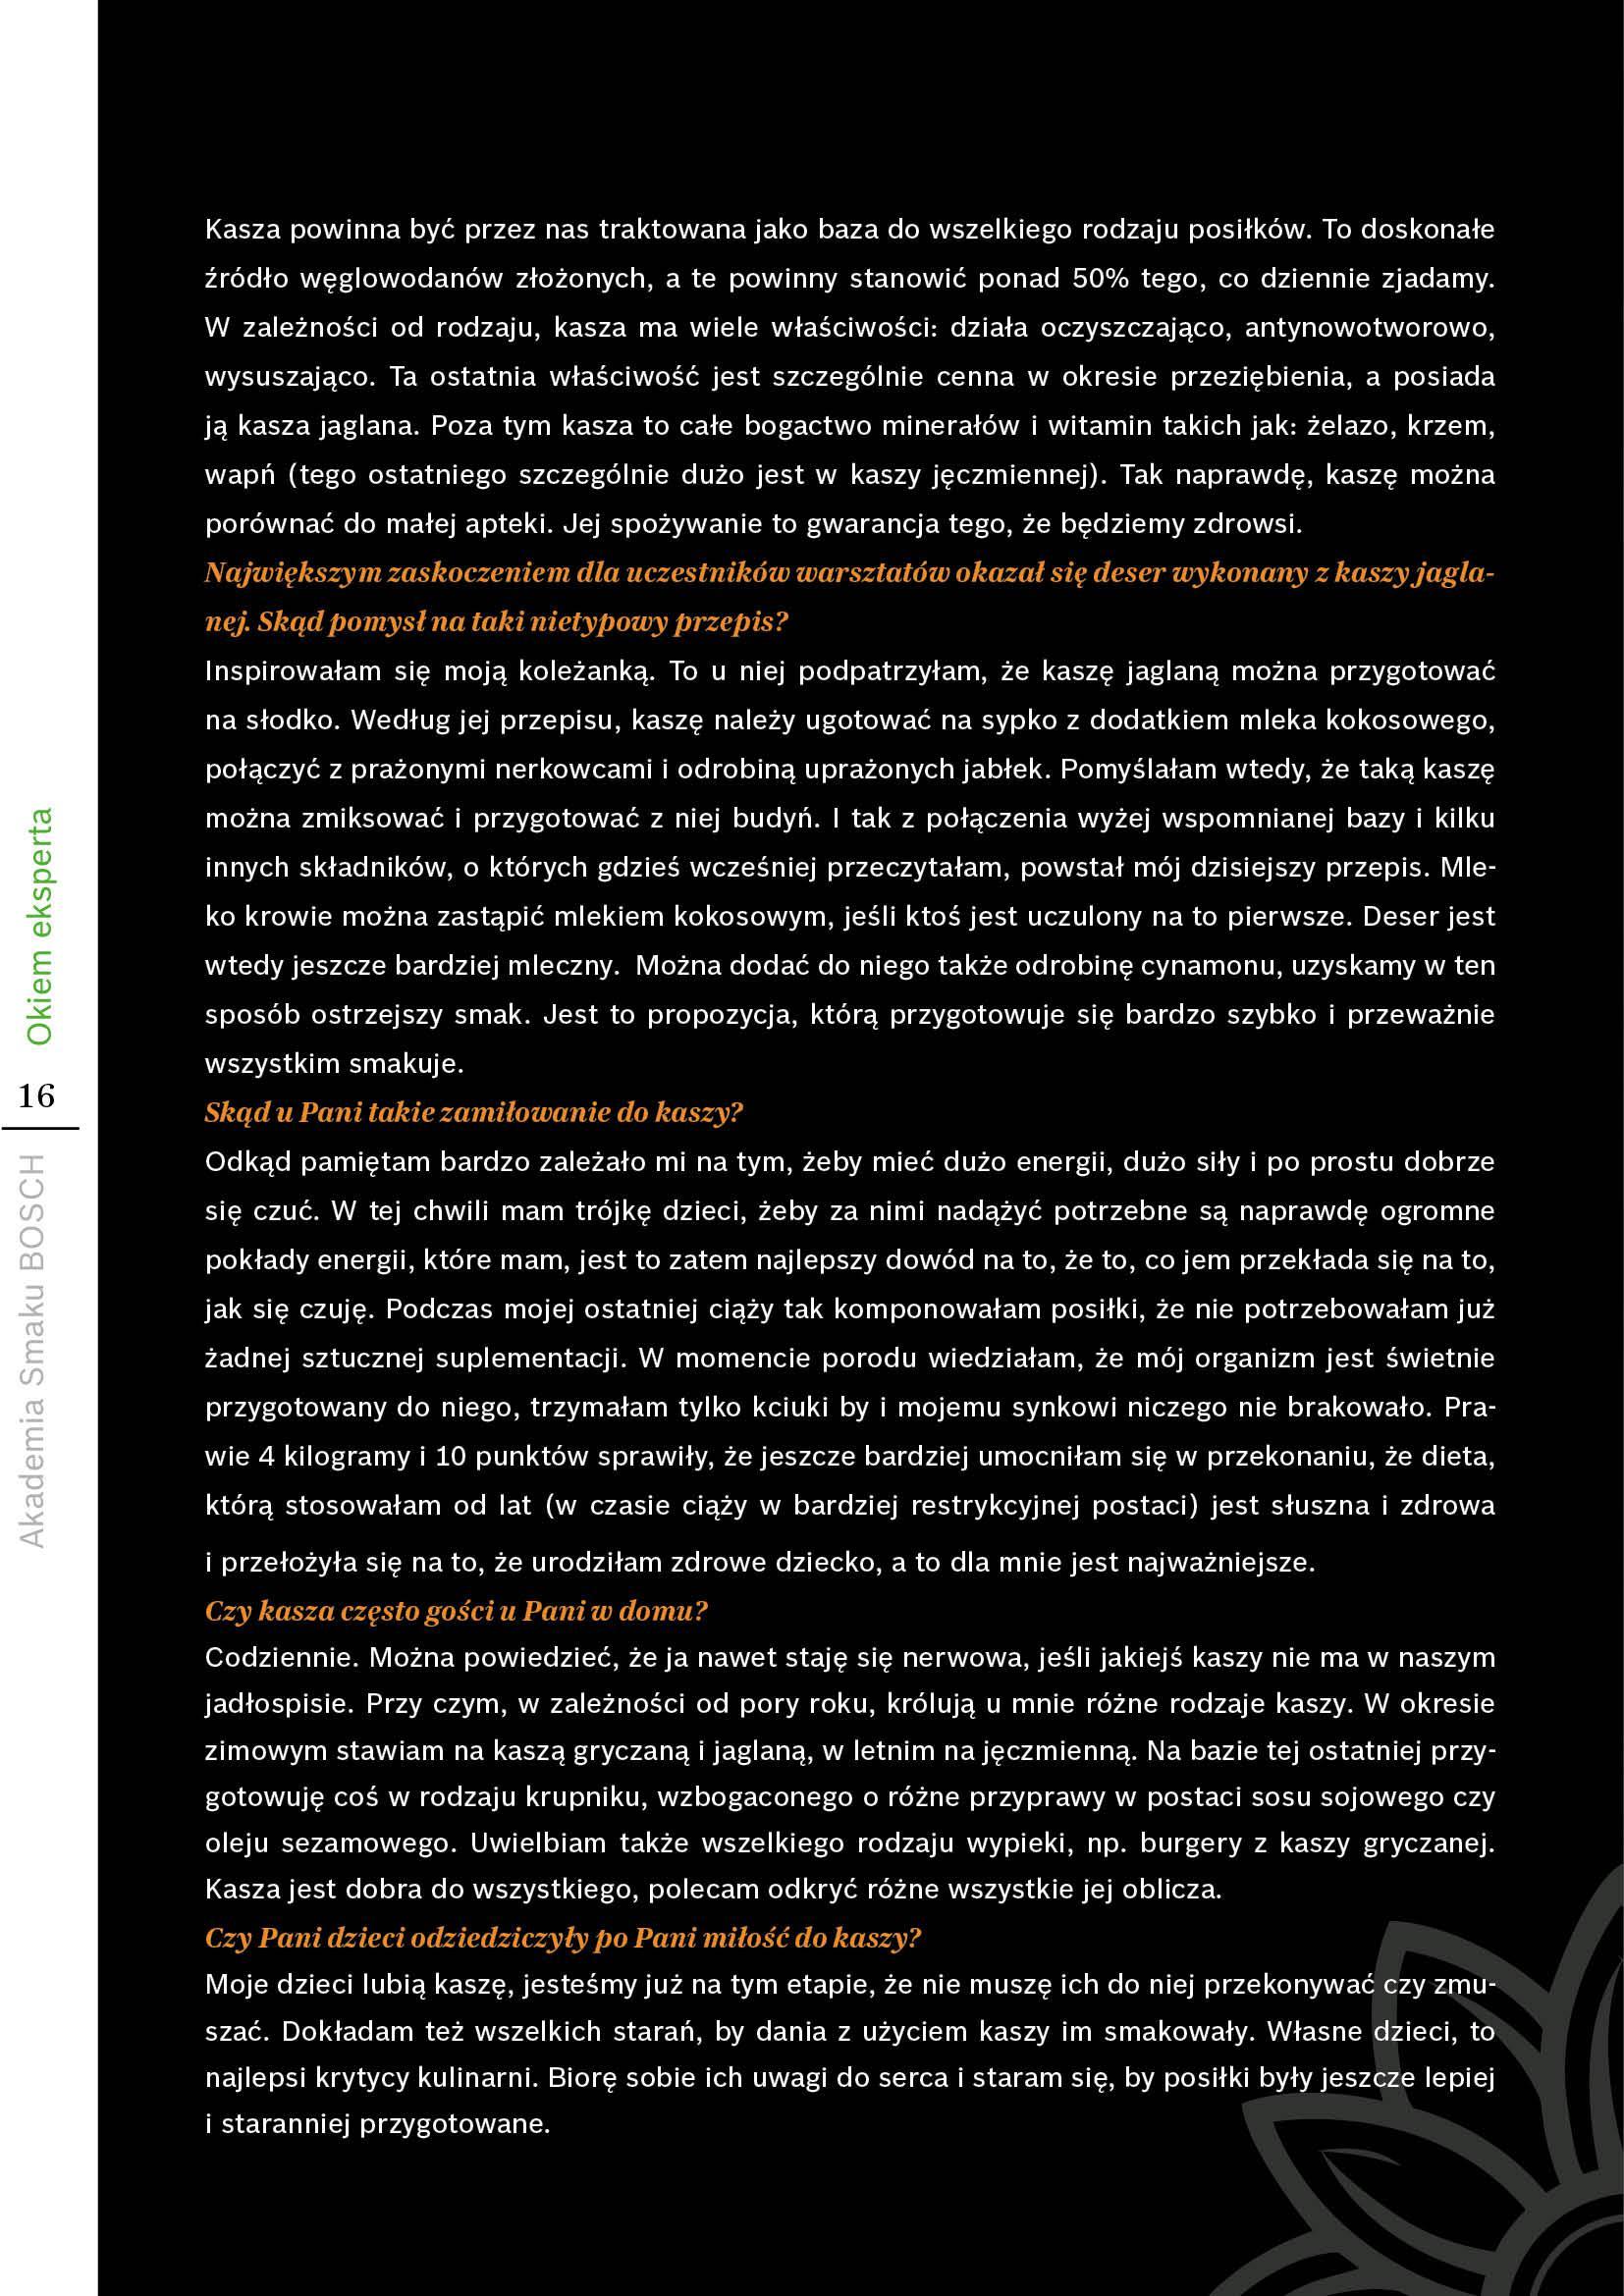 Nasza Kasza - Strona 16